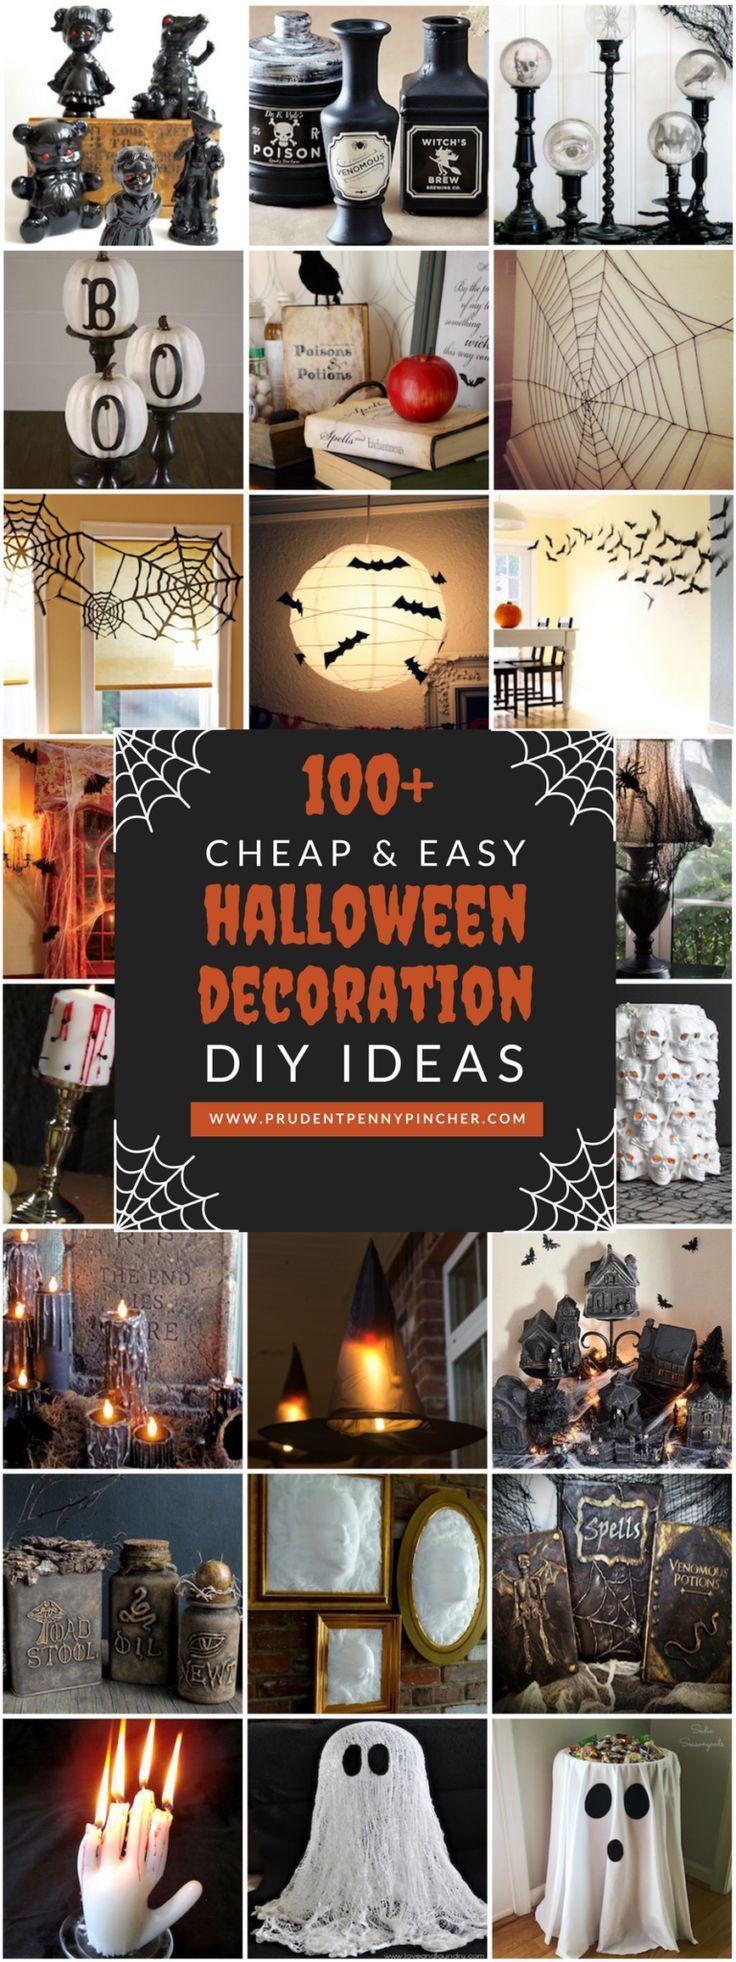 groß 100 Dollar Store Halloween Decorations